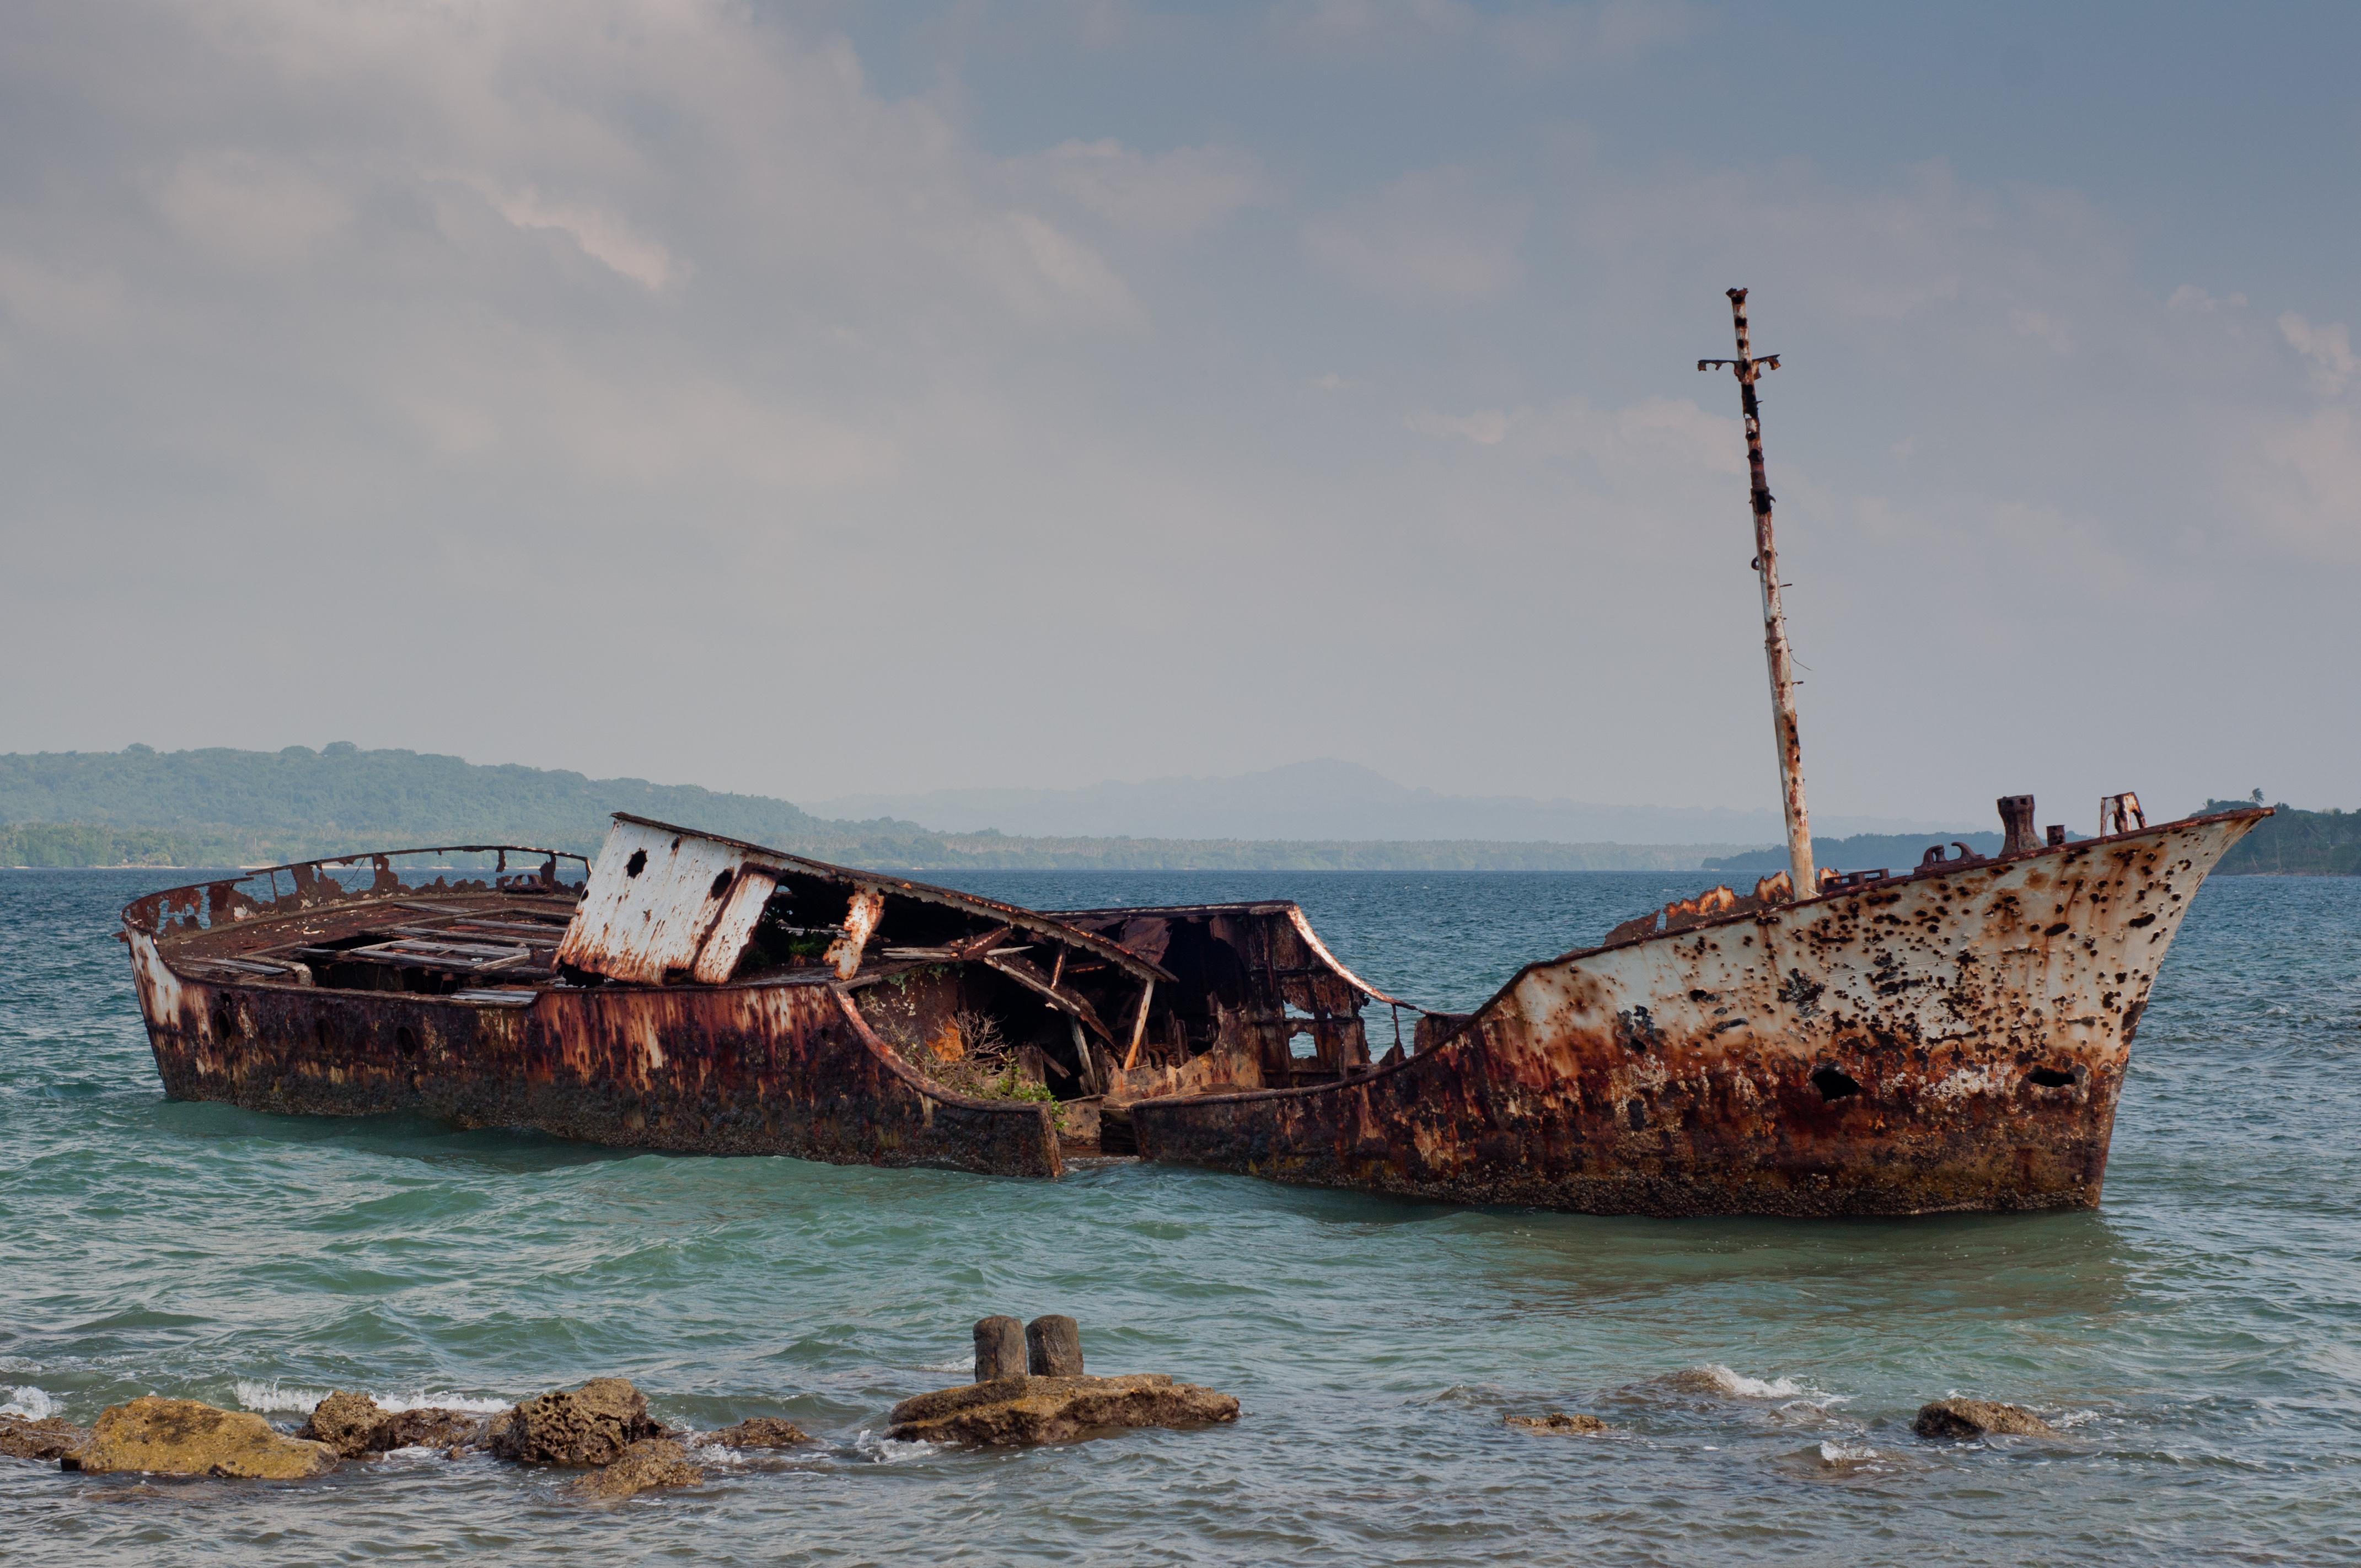 File:Santo-island-living-3.jpg - Wikimedia Commons